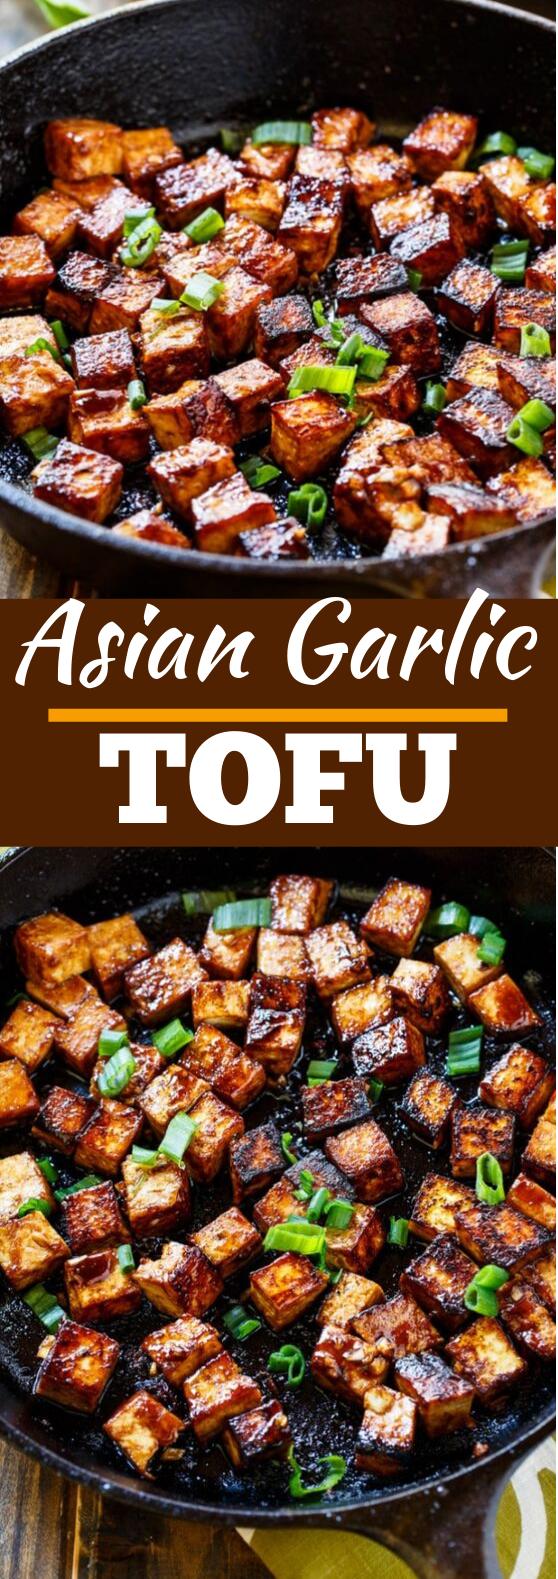 Asian Garlic Tofu #vegan #dinner